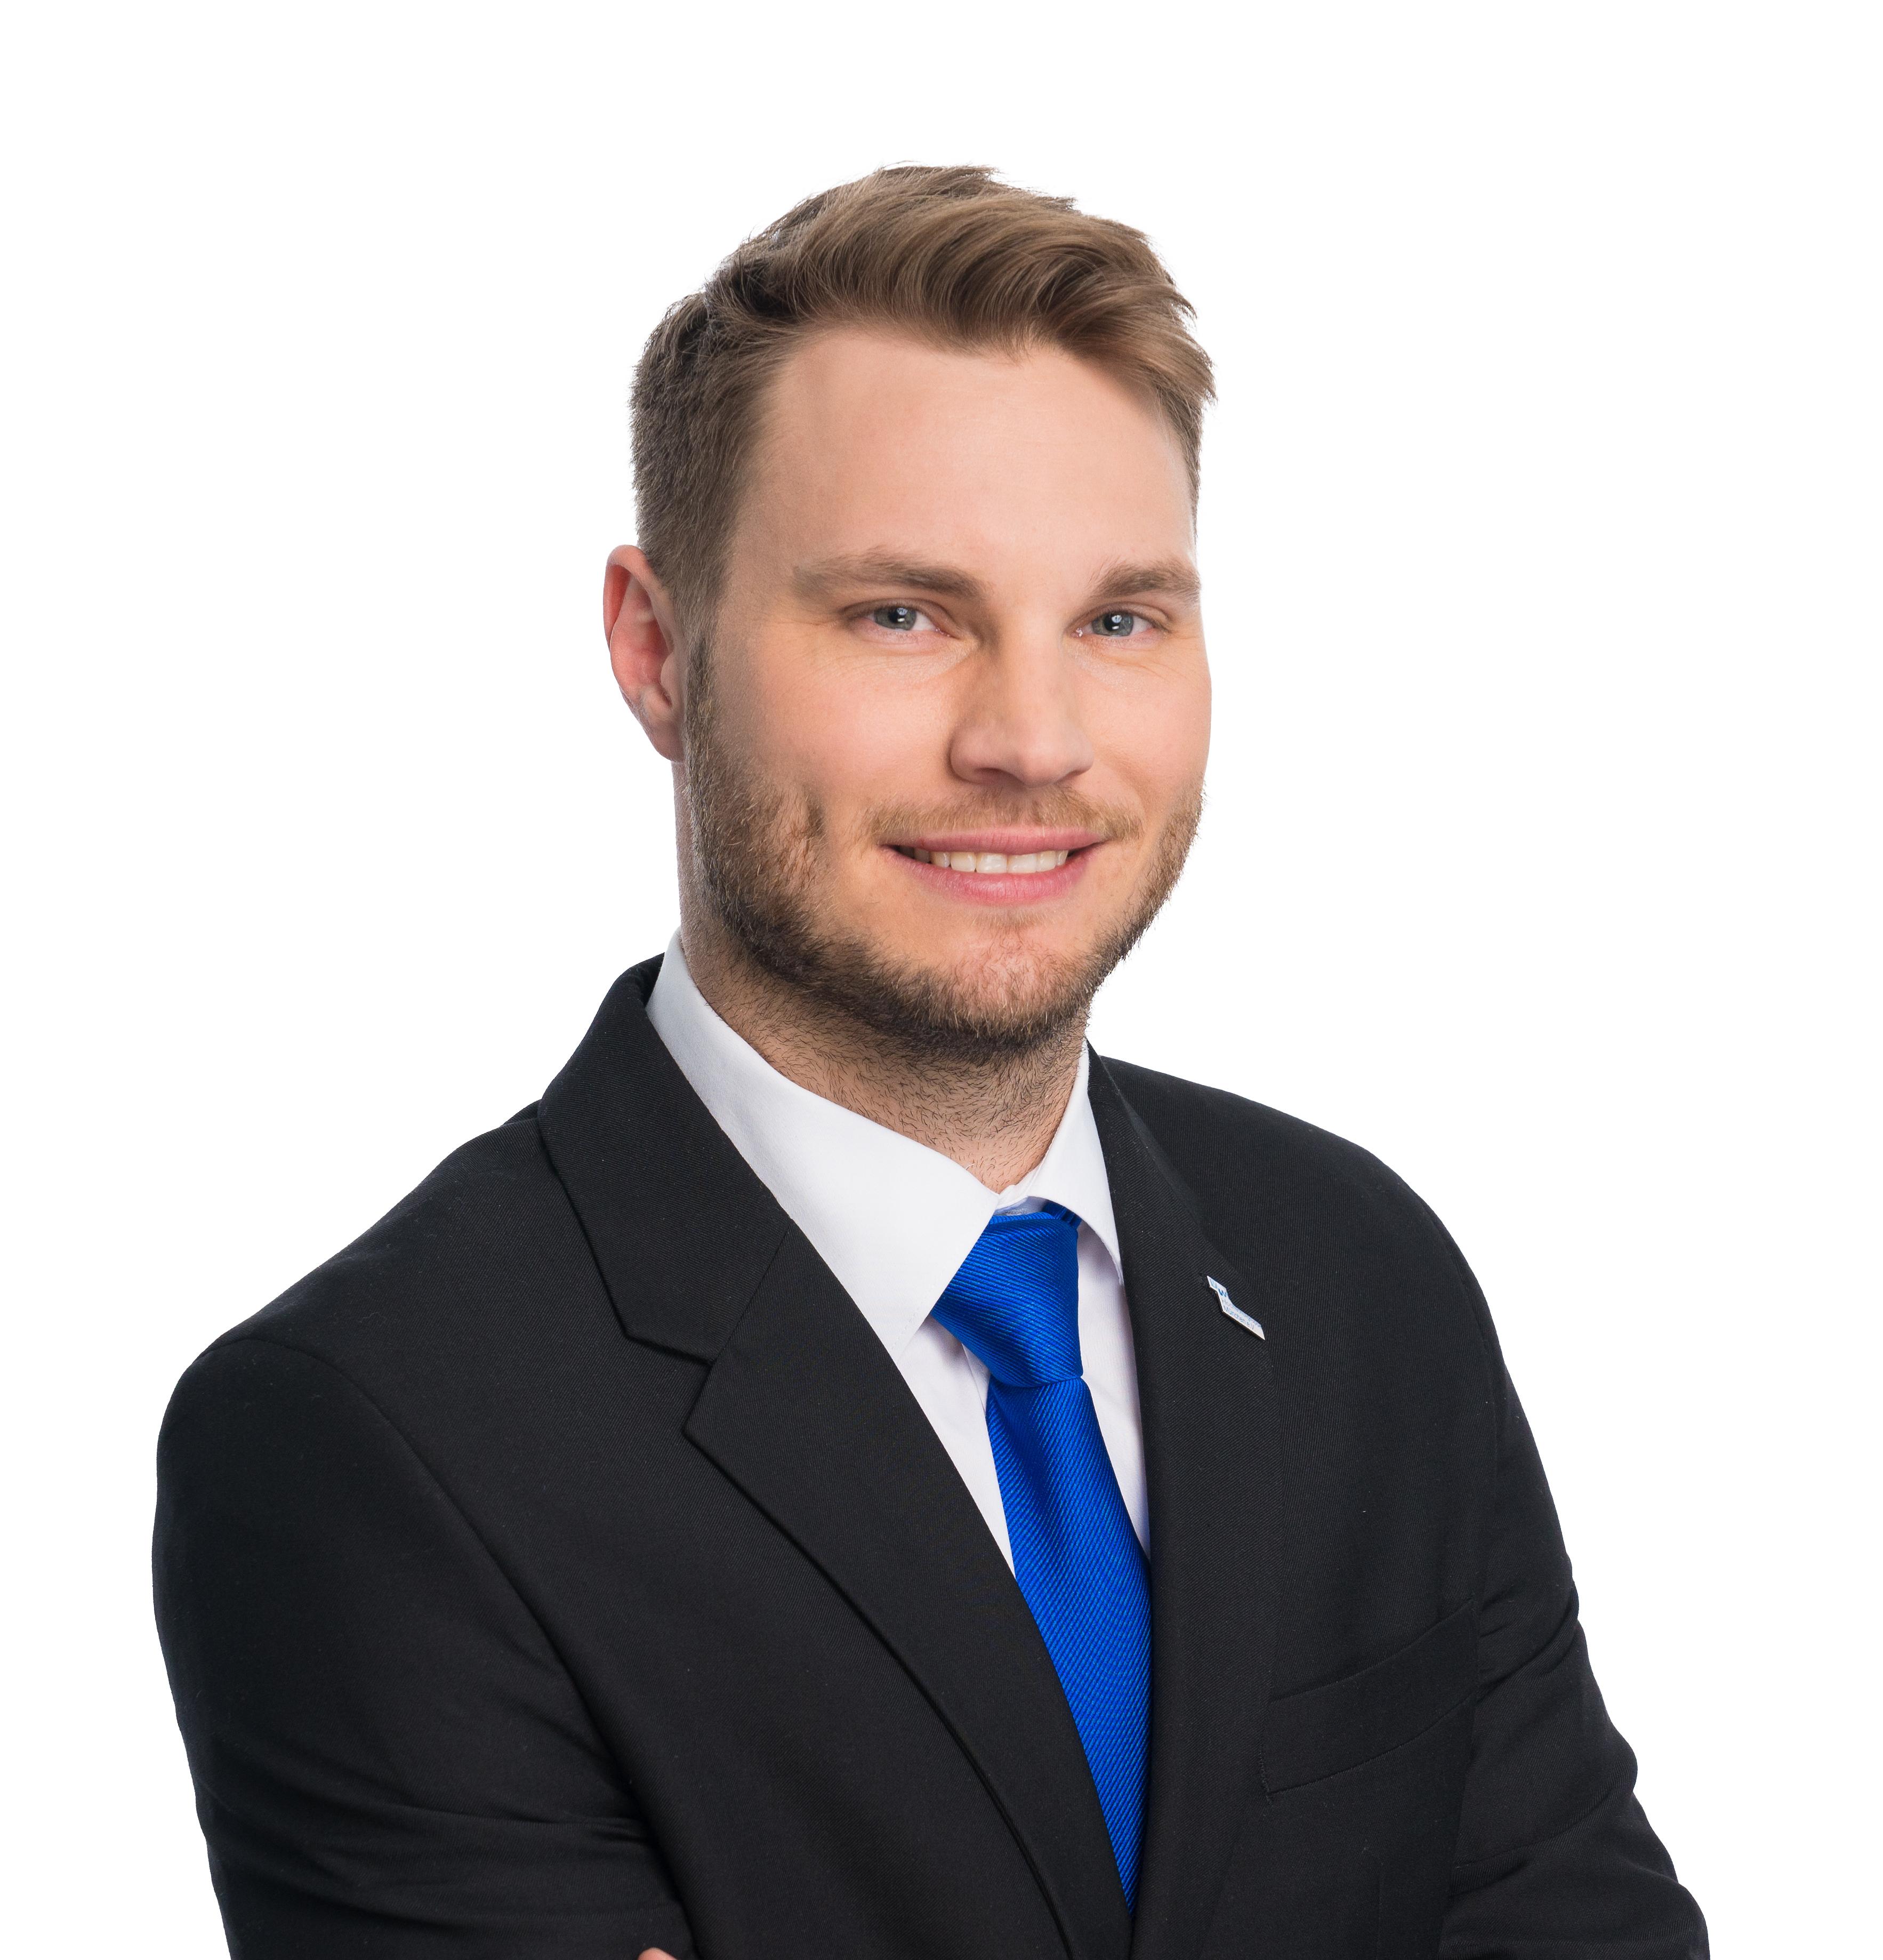 Erik Sißmann